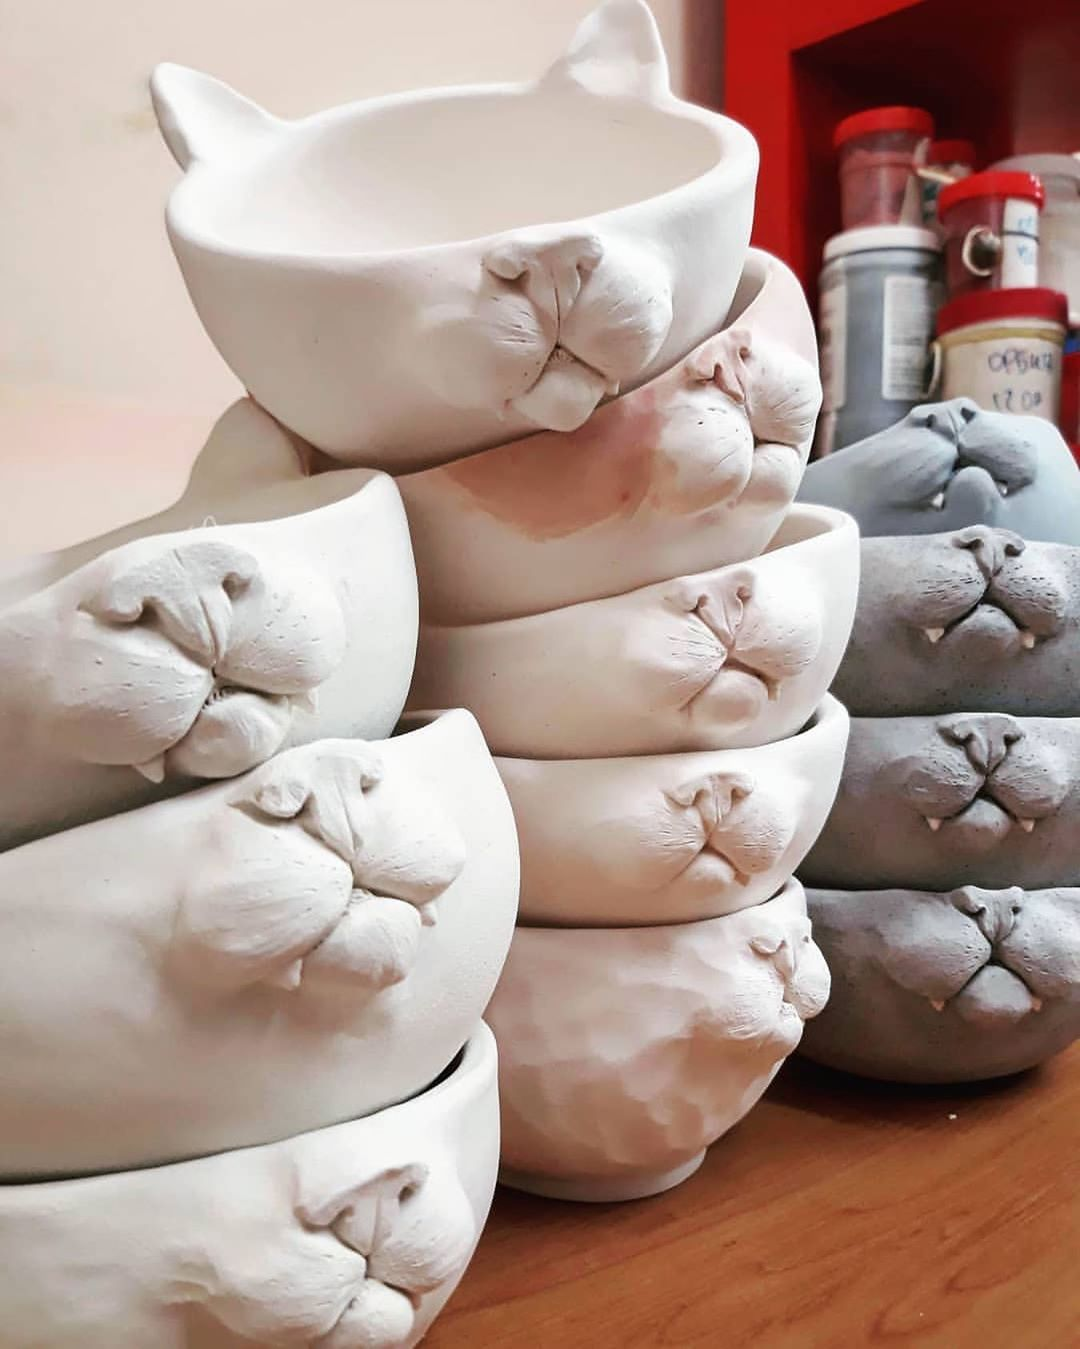 "Pottery Scout on Instagram: ""Lovely bowls by @sonrazuma_ceramics 💫 . . . . . . . . . . #bowls #ceramicbowls #cat #potterylife #potteryworks #ceramicglaze #керамист…"""